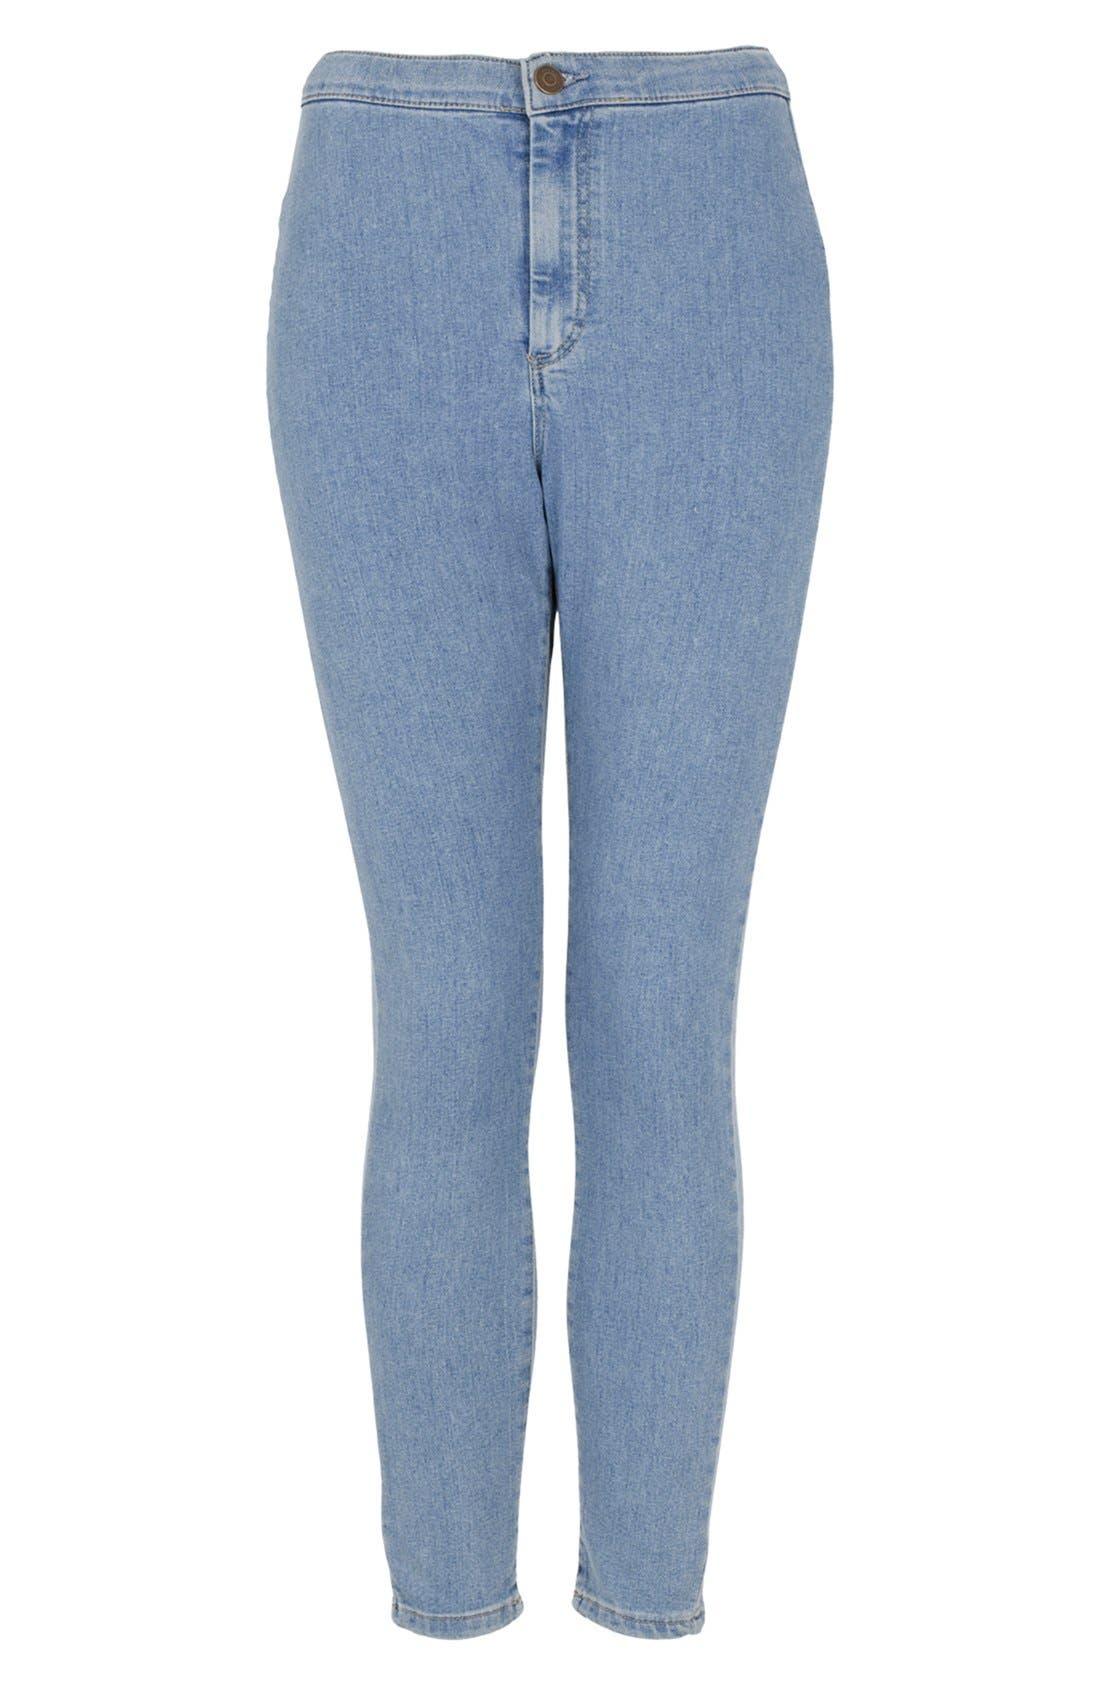 Alternate Image 5  - Topshop Moto 'Joni' High Rise Skinny Jeans (Mid Stone)